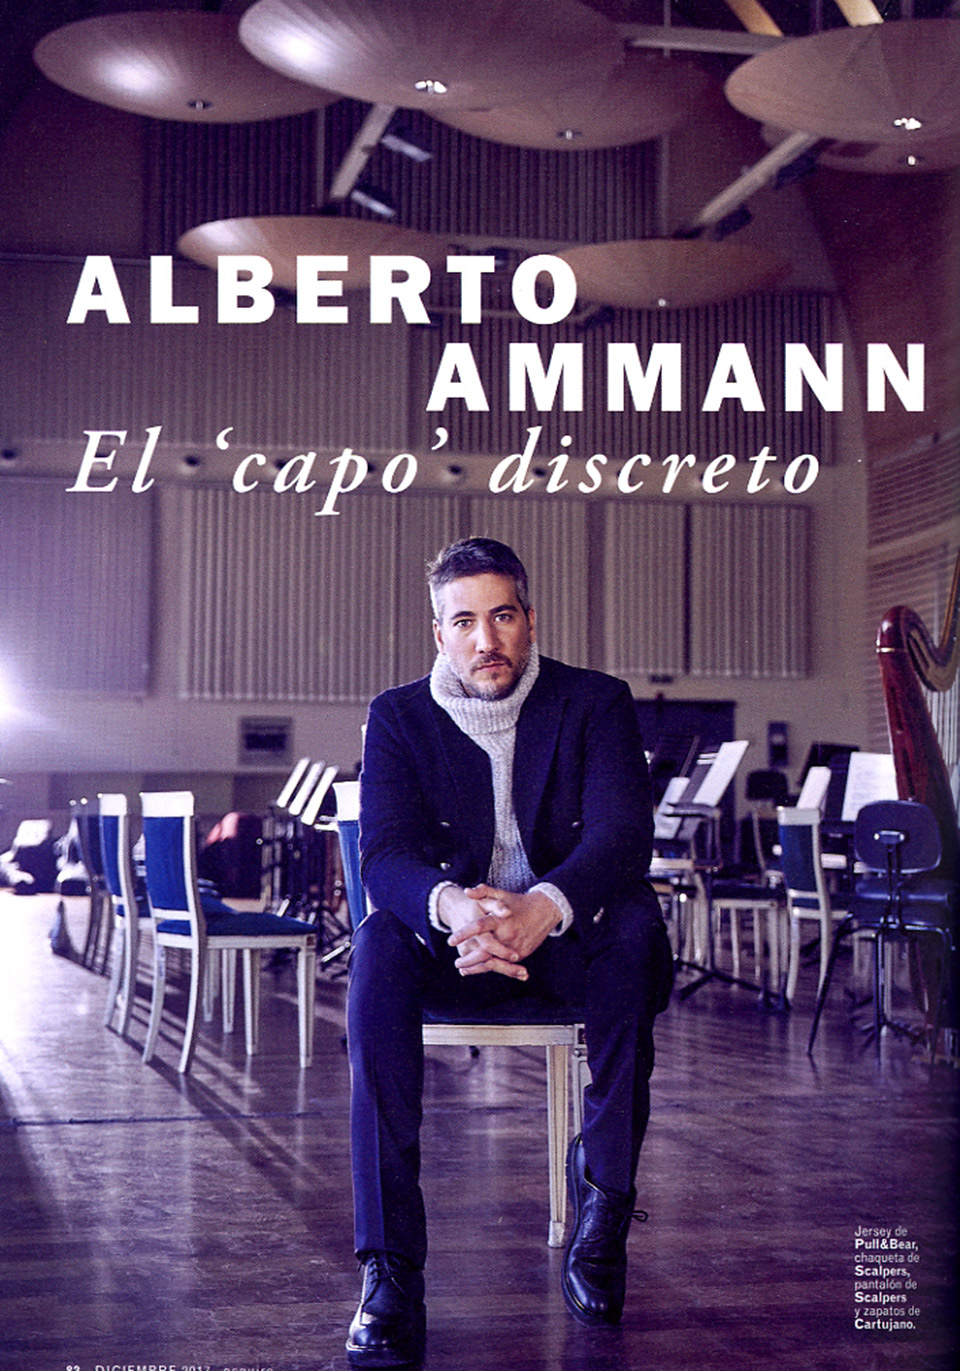 PedroCedeño_AlbertoAmmann-ElCapodiscreto_Agos18